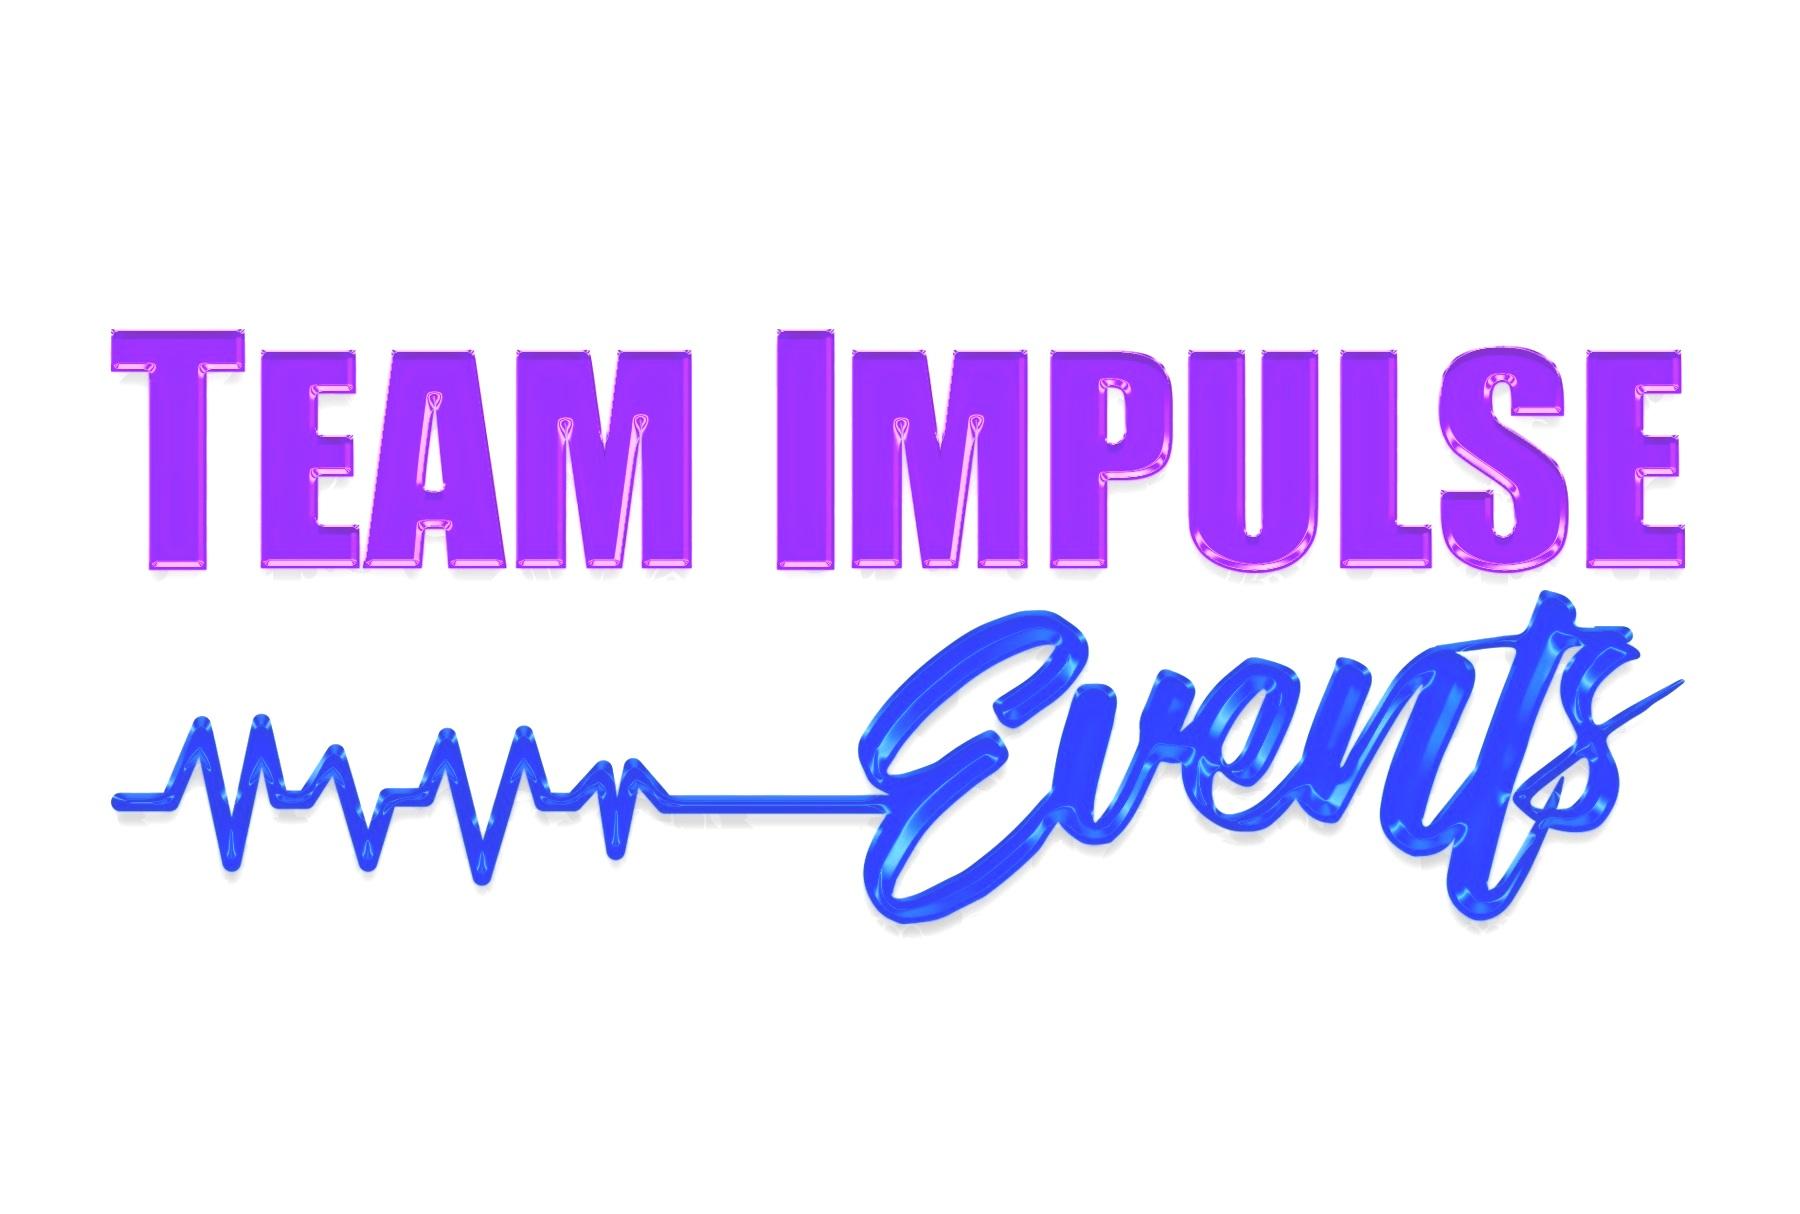 Team%252BImpulse%252BEvents%252Bwith%252BEffects%252BWhite%252B.jpg